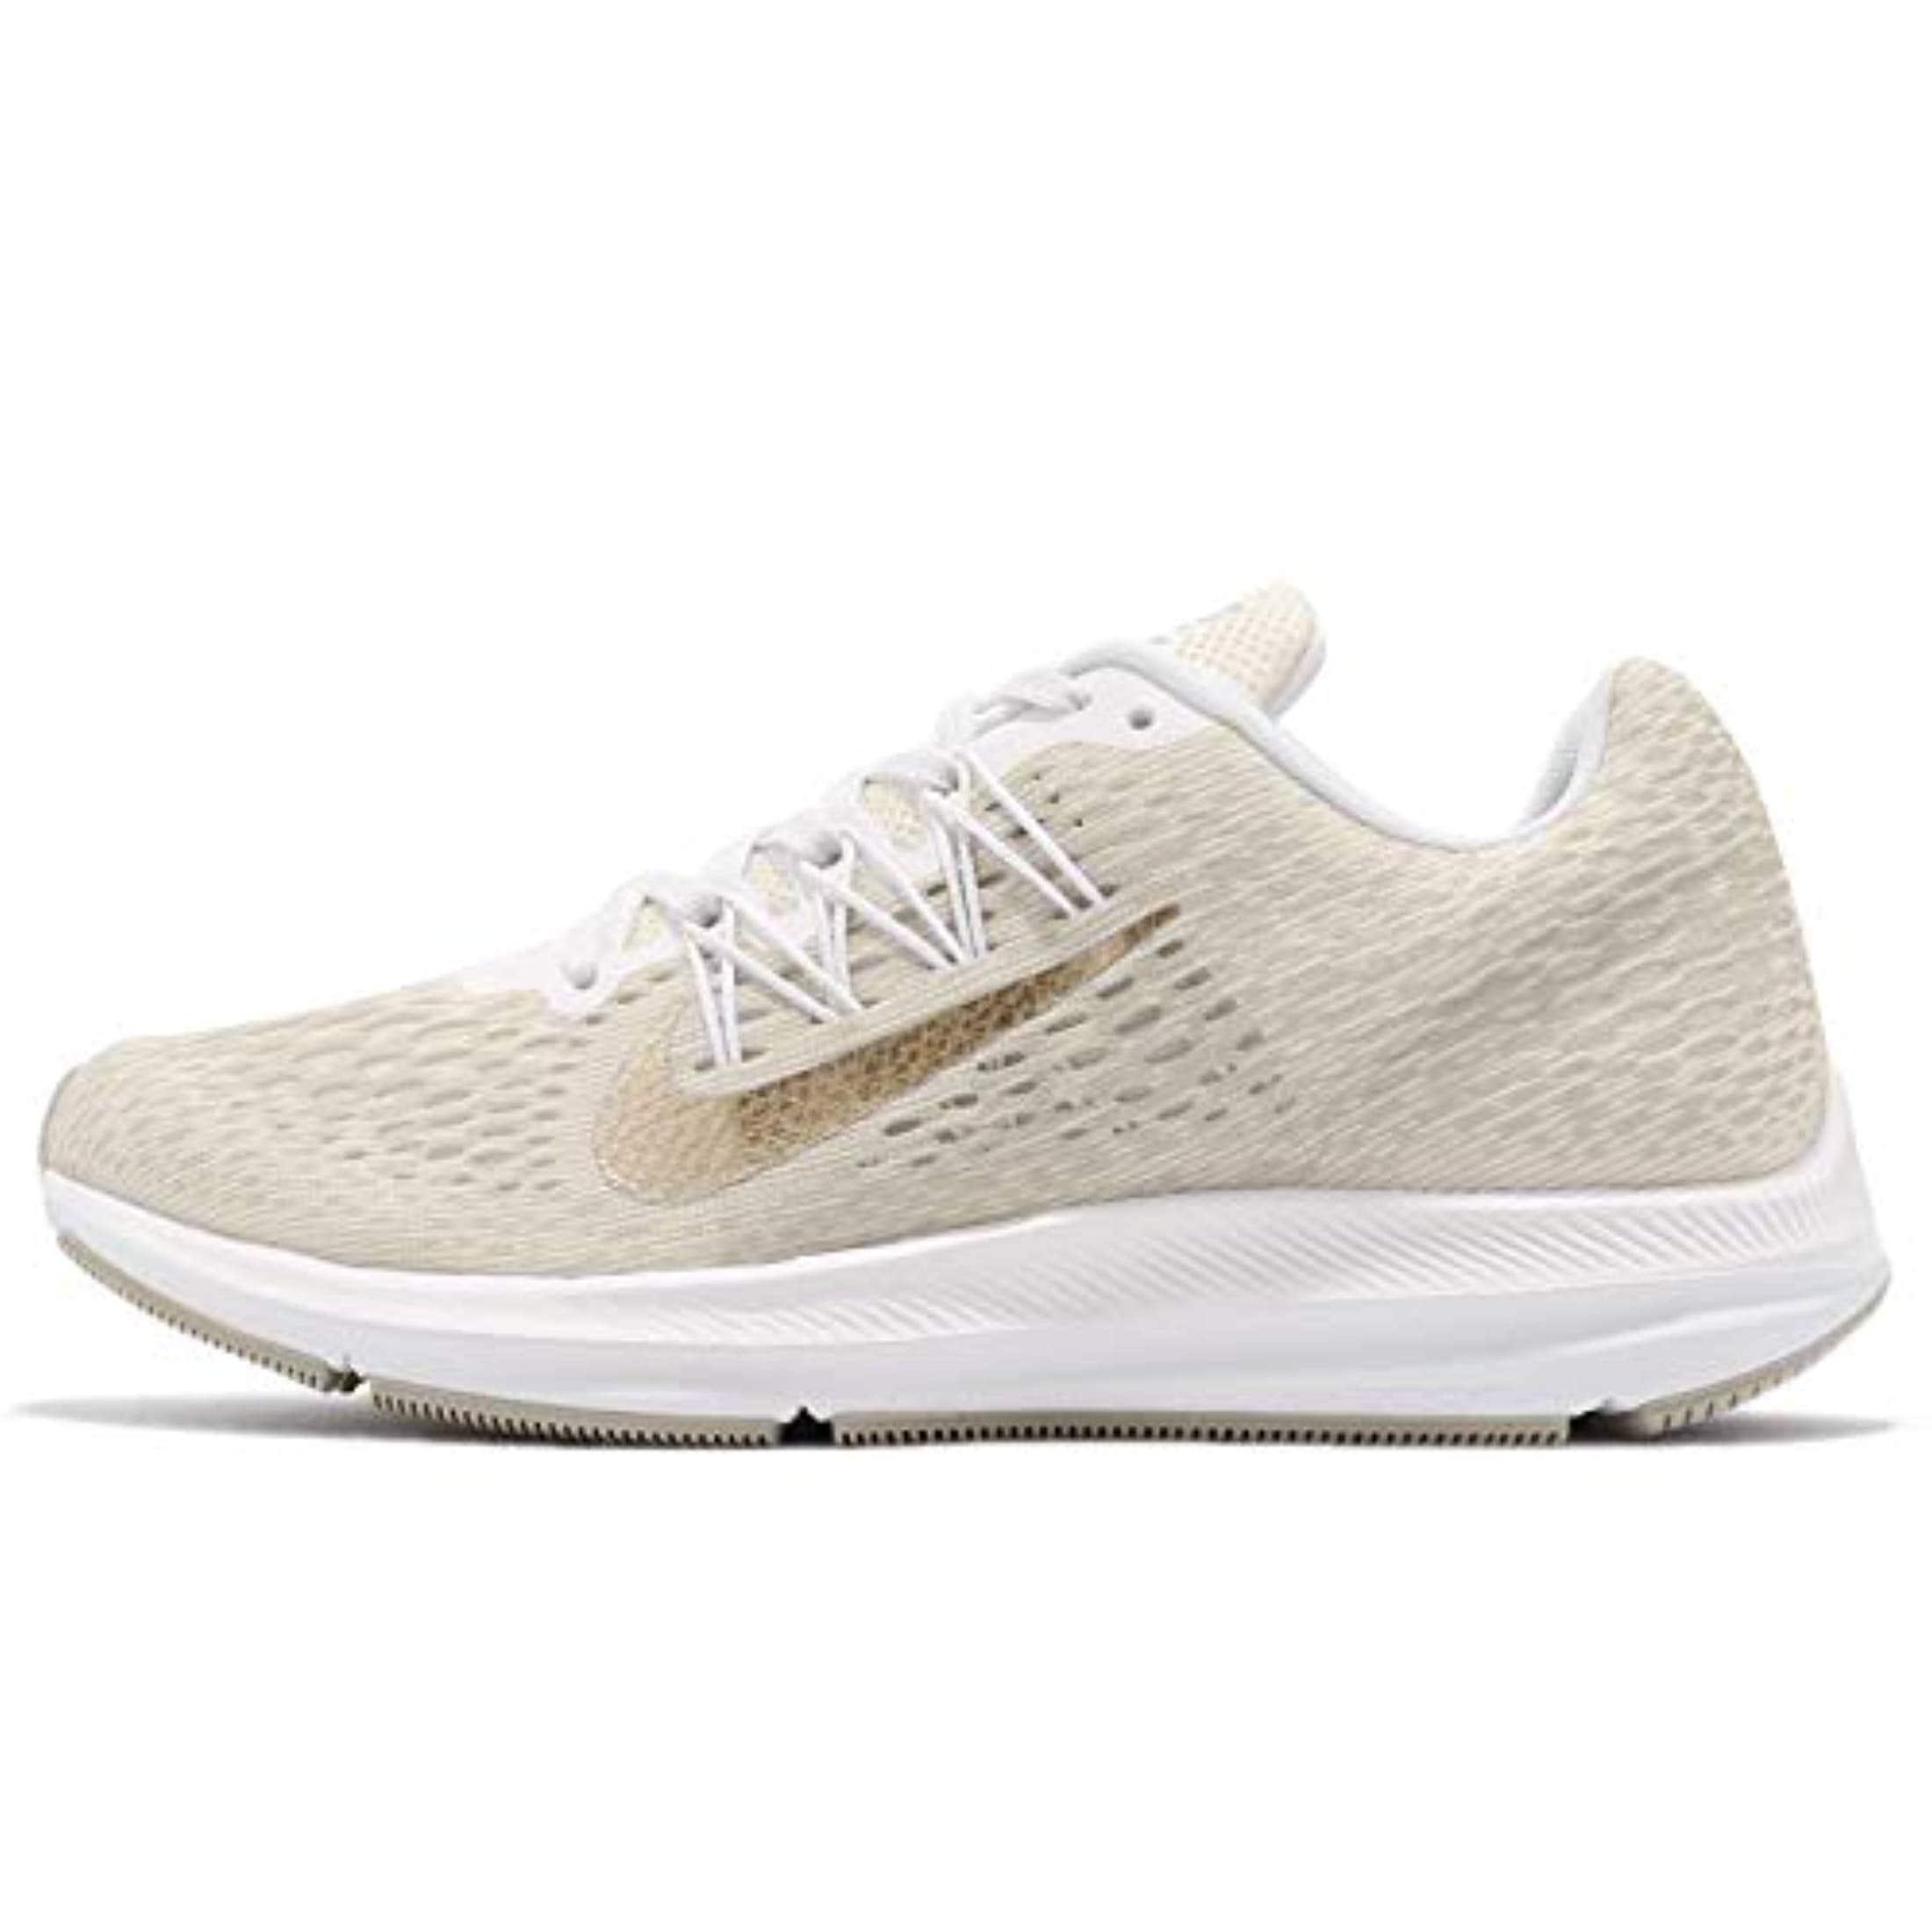 low priced dde50 ccc80 Shop Nike Women s Air Zoom Winflo 5 Running Shoe Phantom Metallic  Gold-String-White - Free Shipping Today - Overstock - 27121891